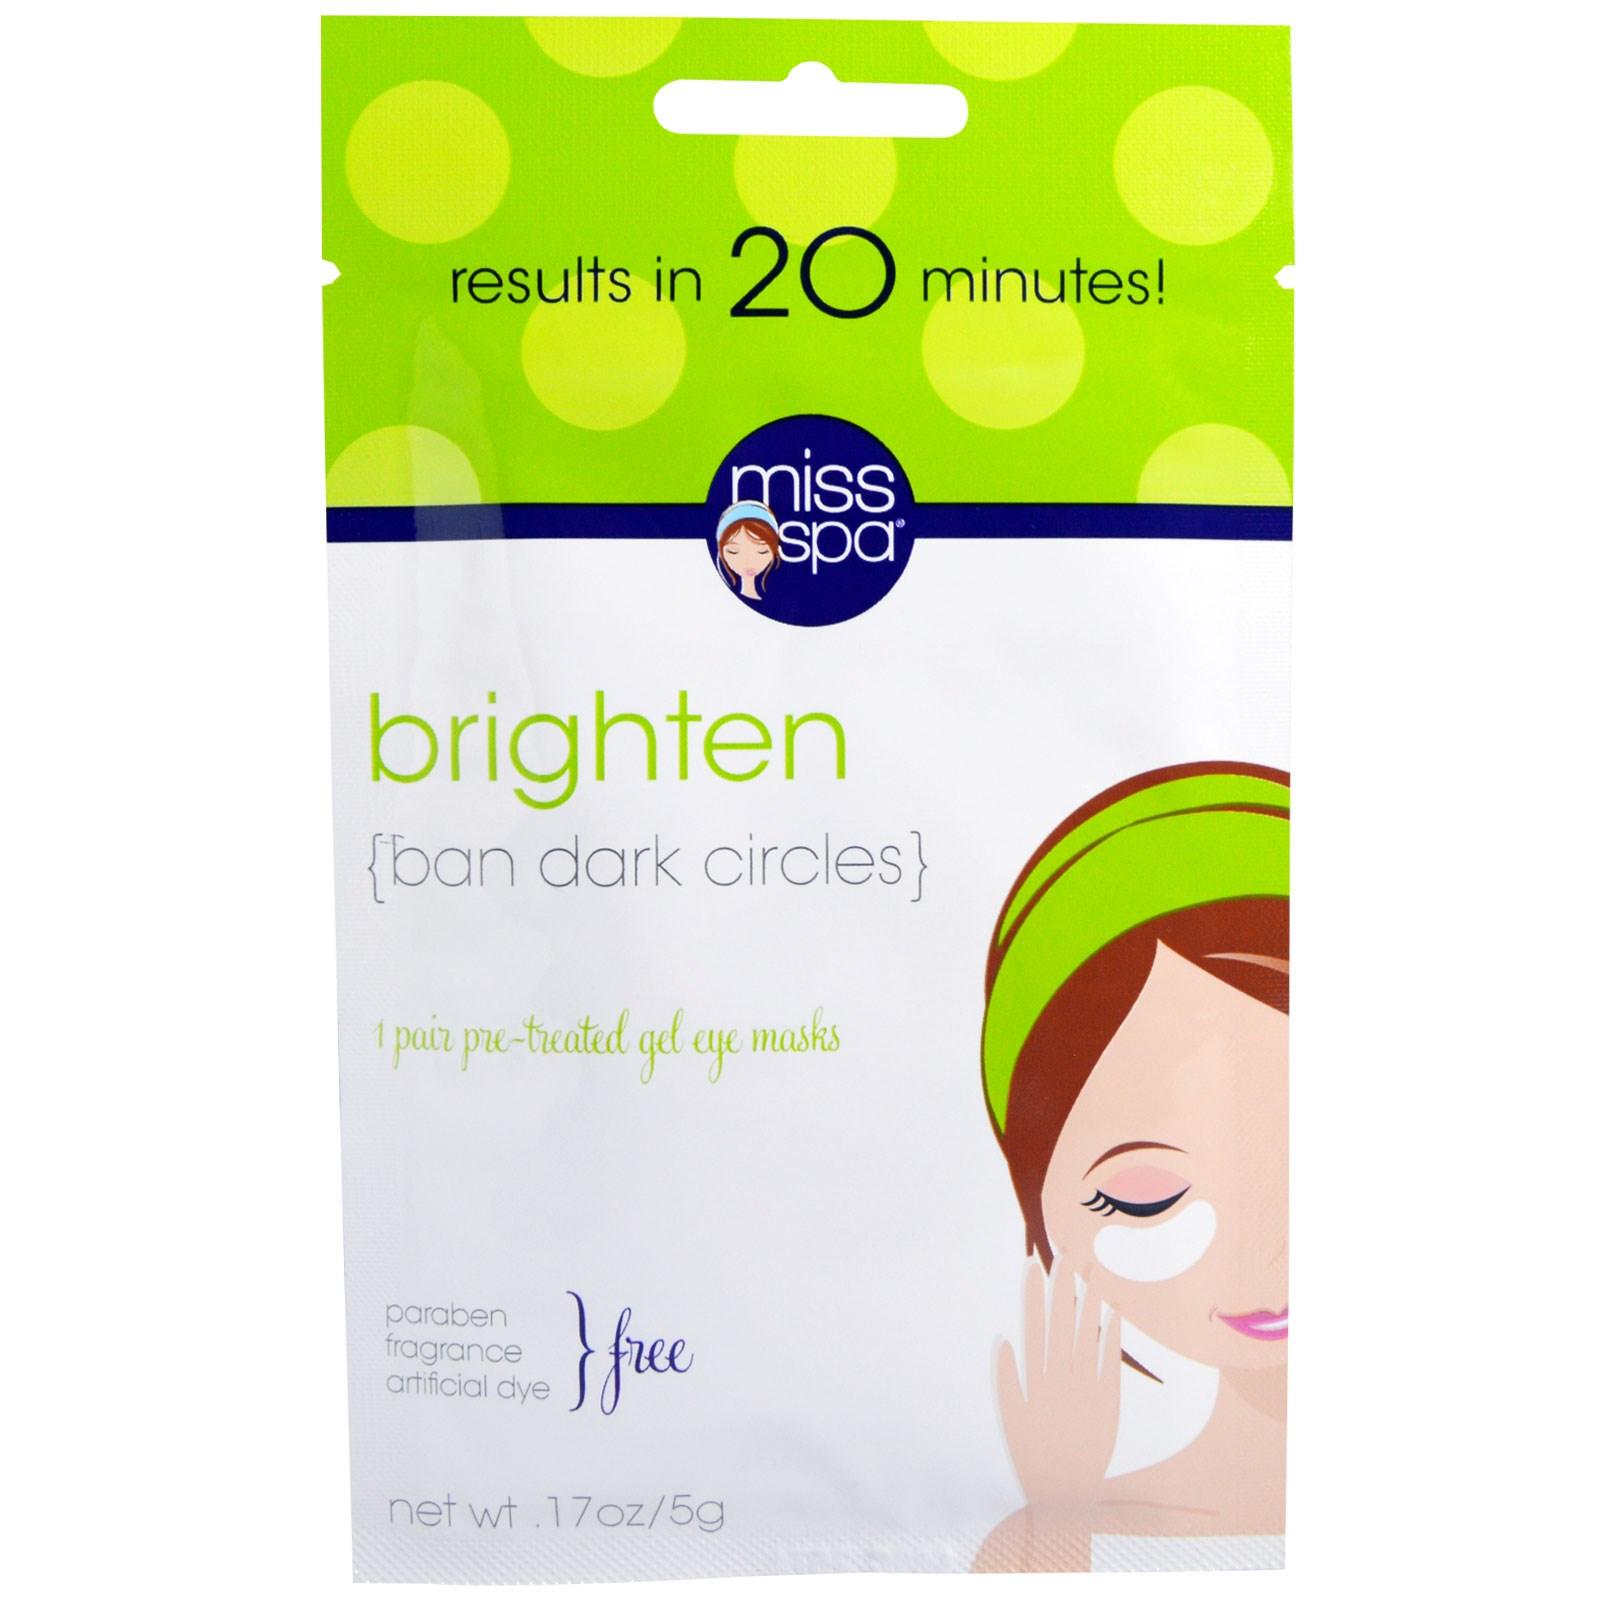 Miss Spa, Energize, Pre-Treated Gel Eye Masks, 1 Pair(pack of 4) Mario Badescu - Peptide Renewal Serum - 29ml/1oz